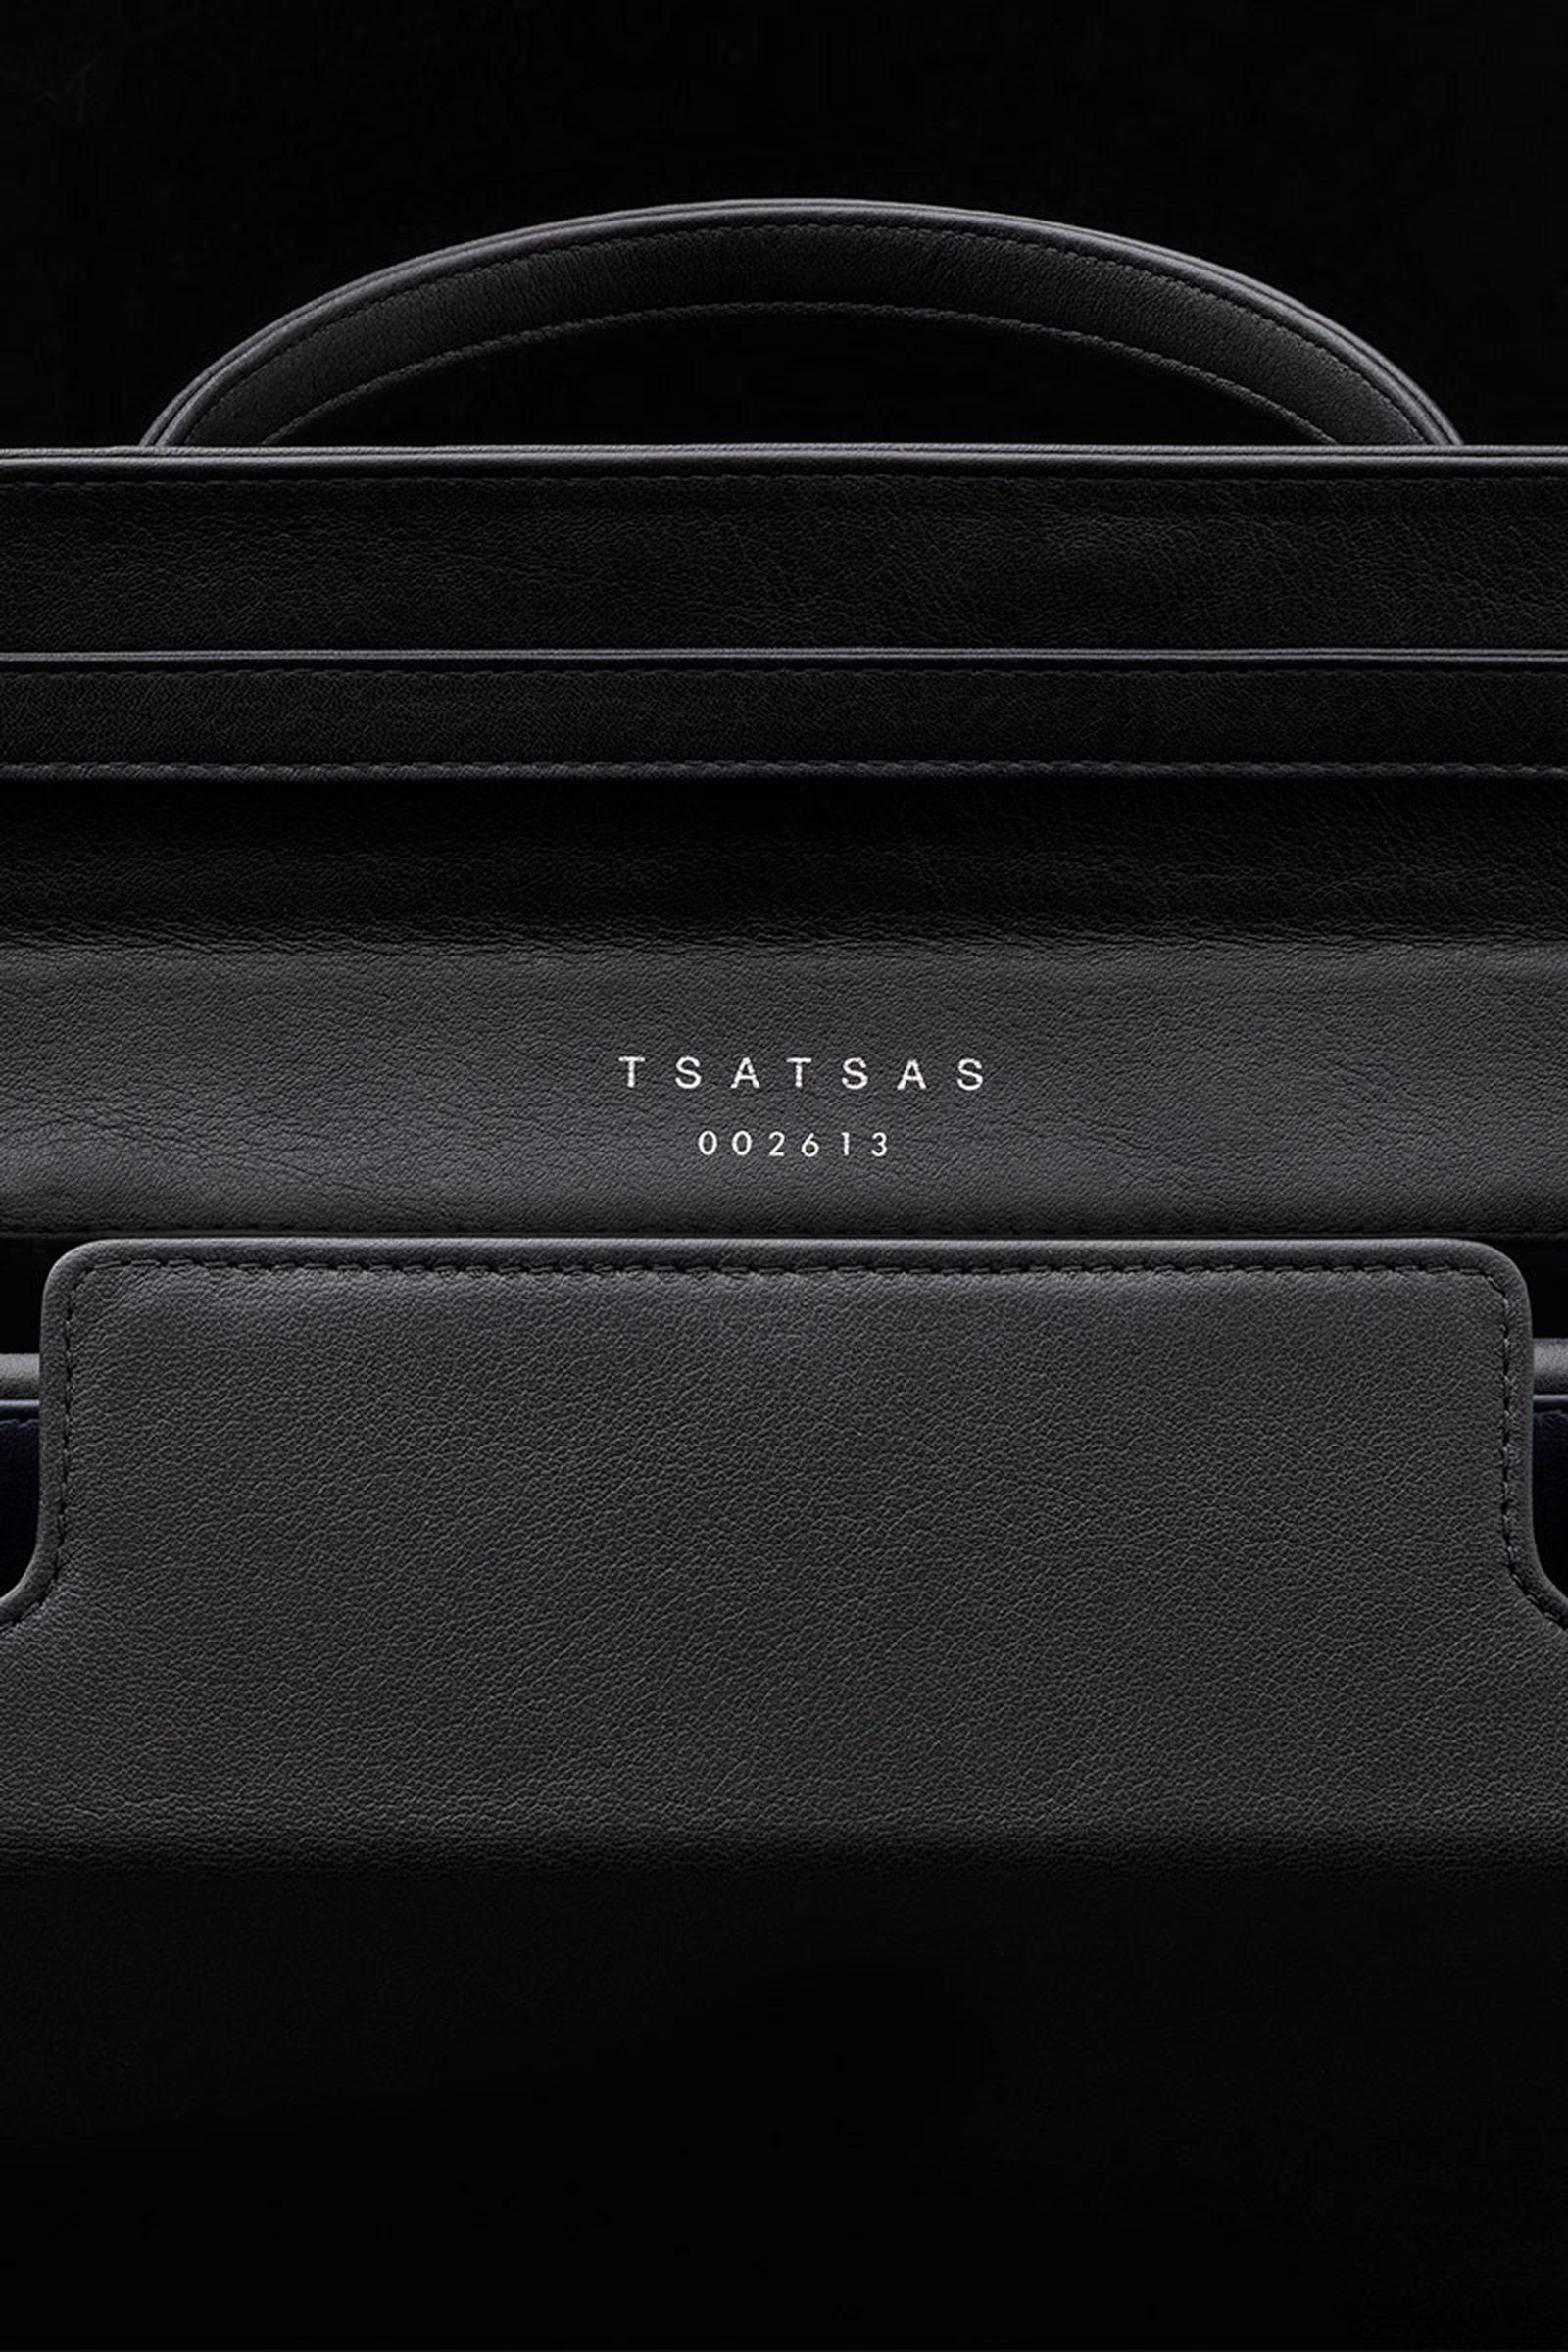 dieter rams latest project leather handbag tsatsas